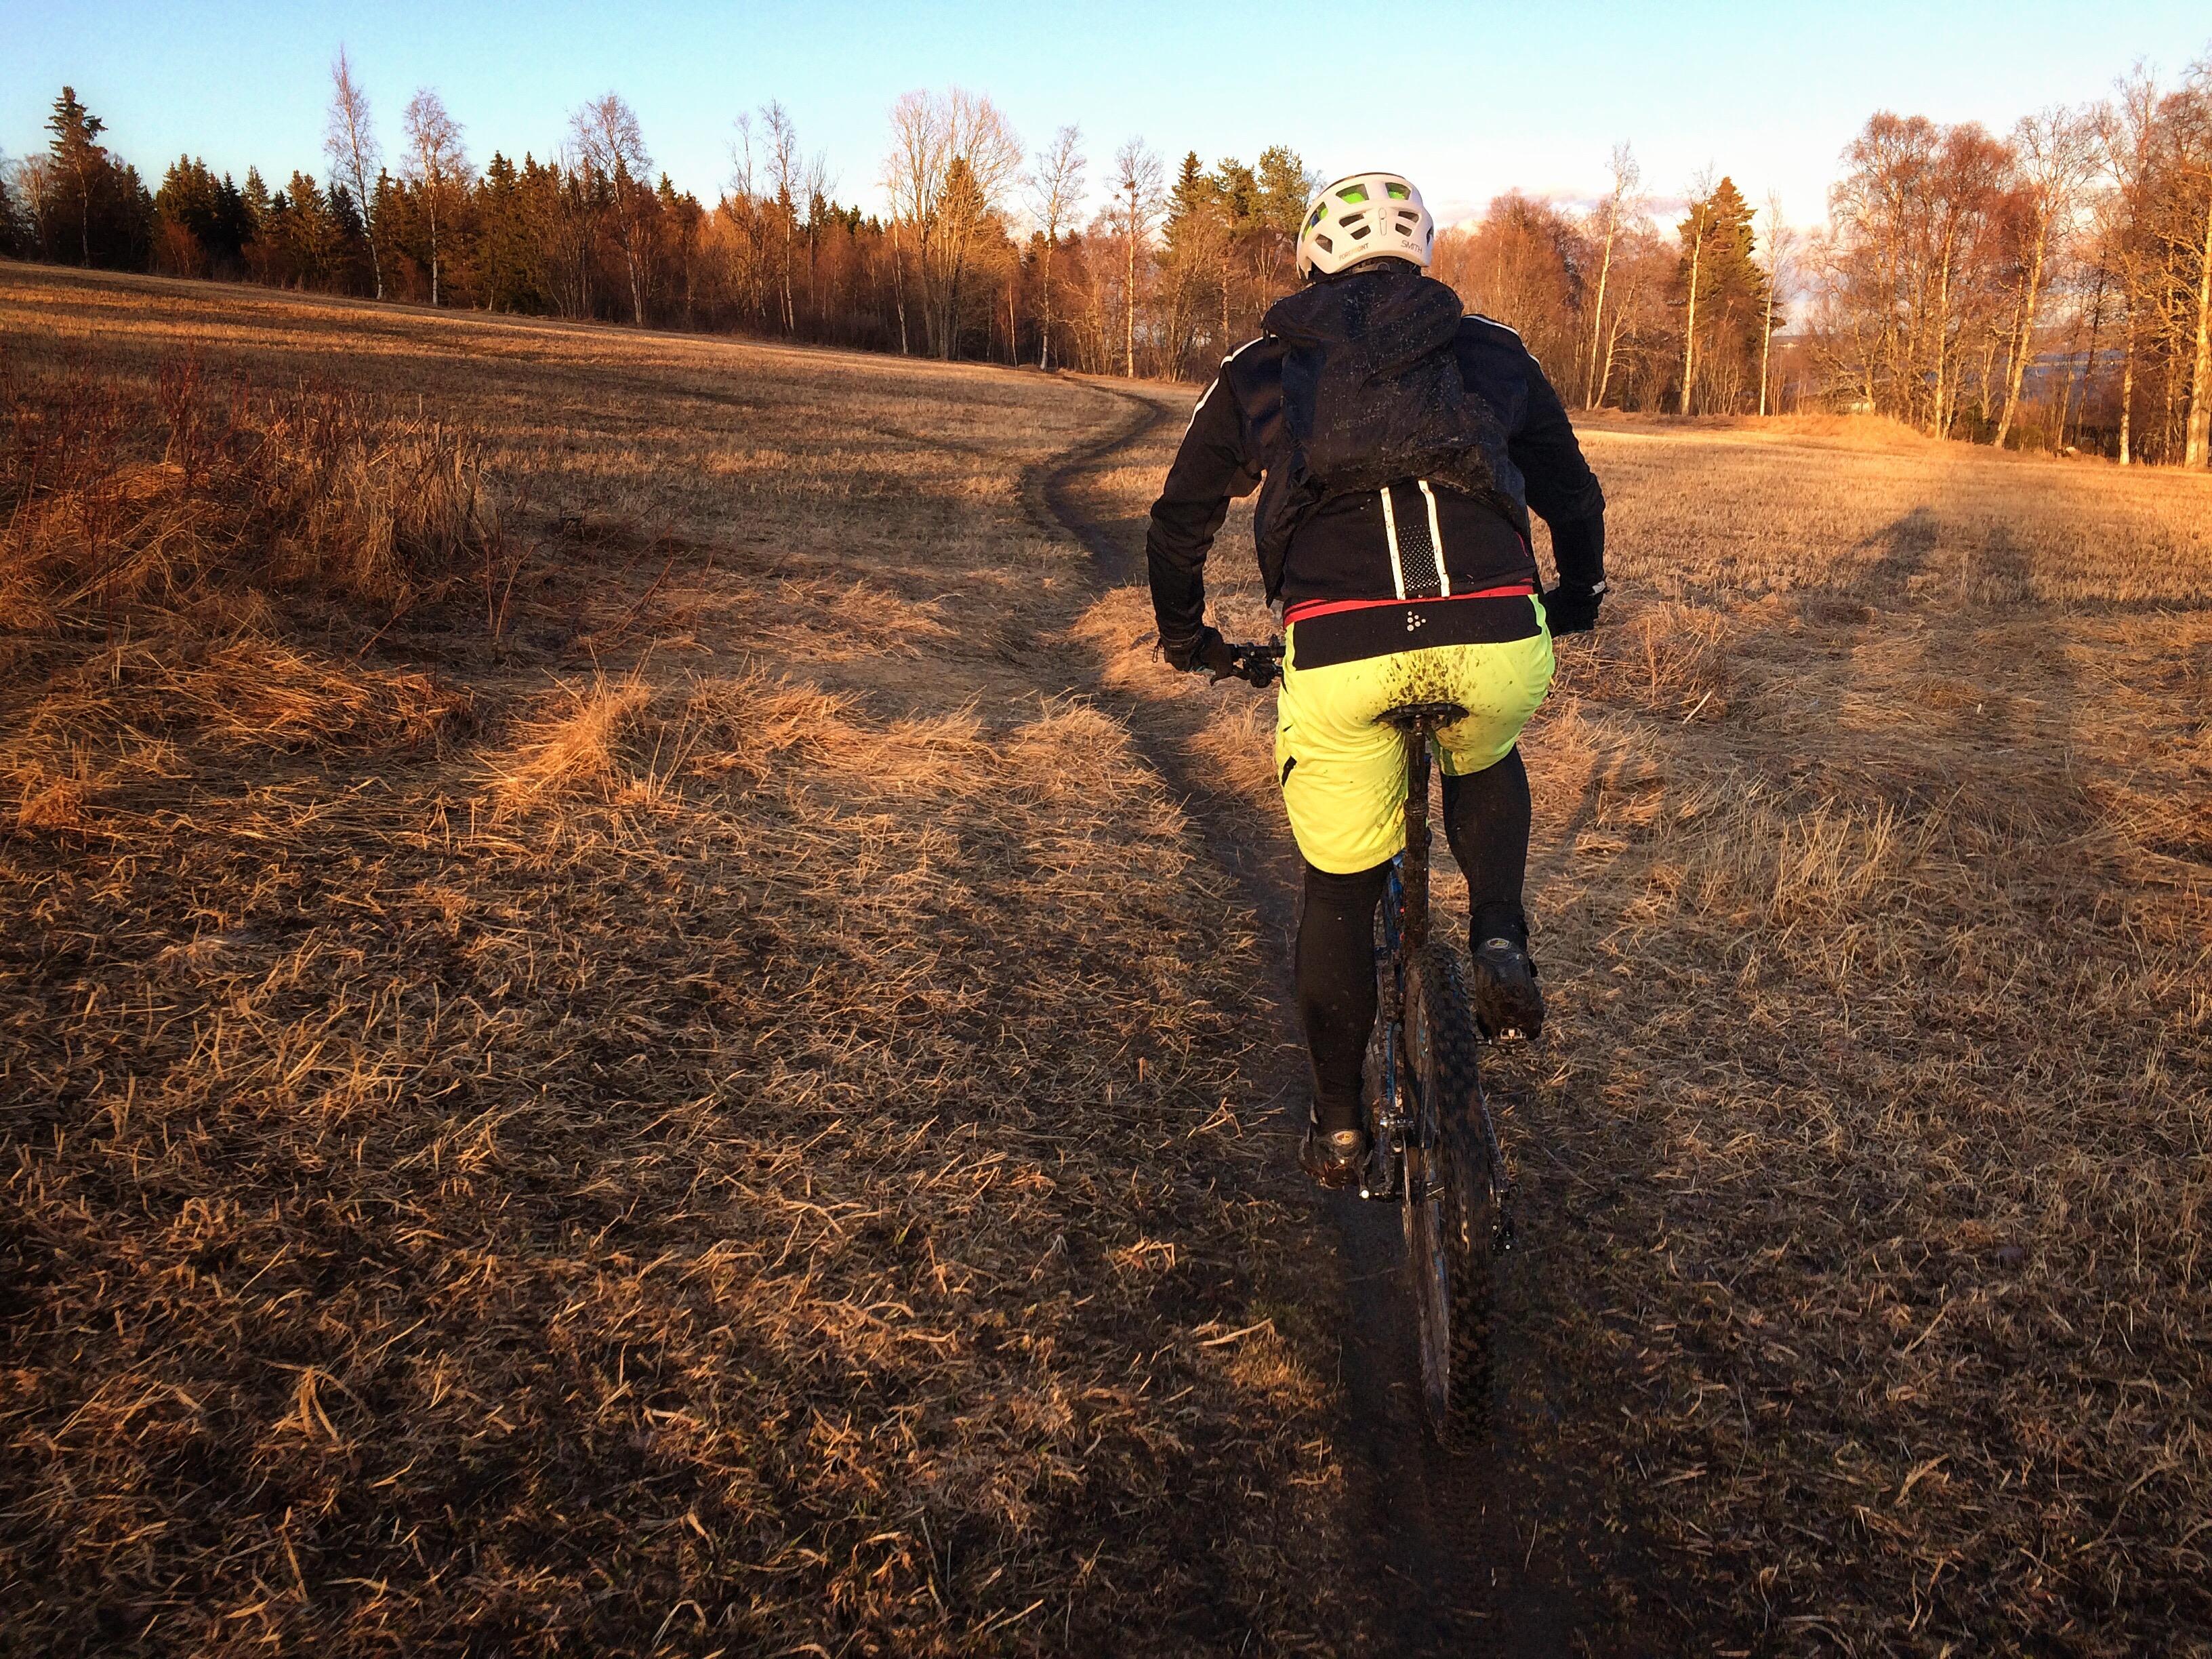 craft sportswear fuji auric östetsund frösön cykling